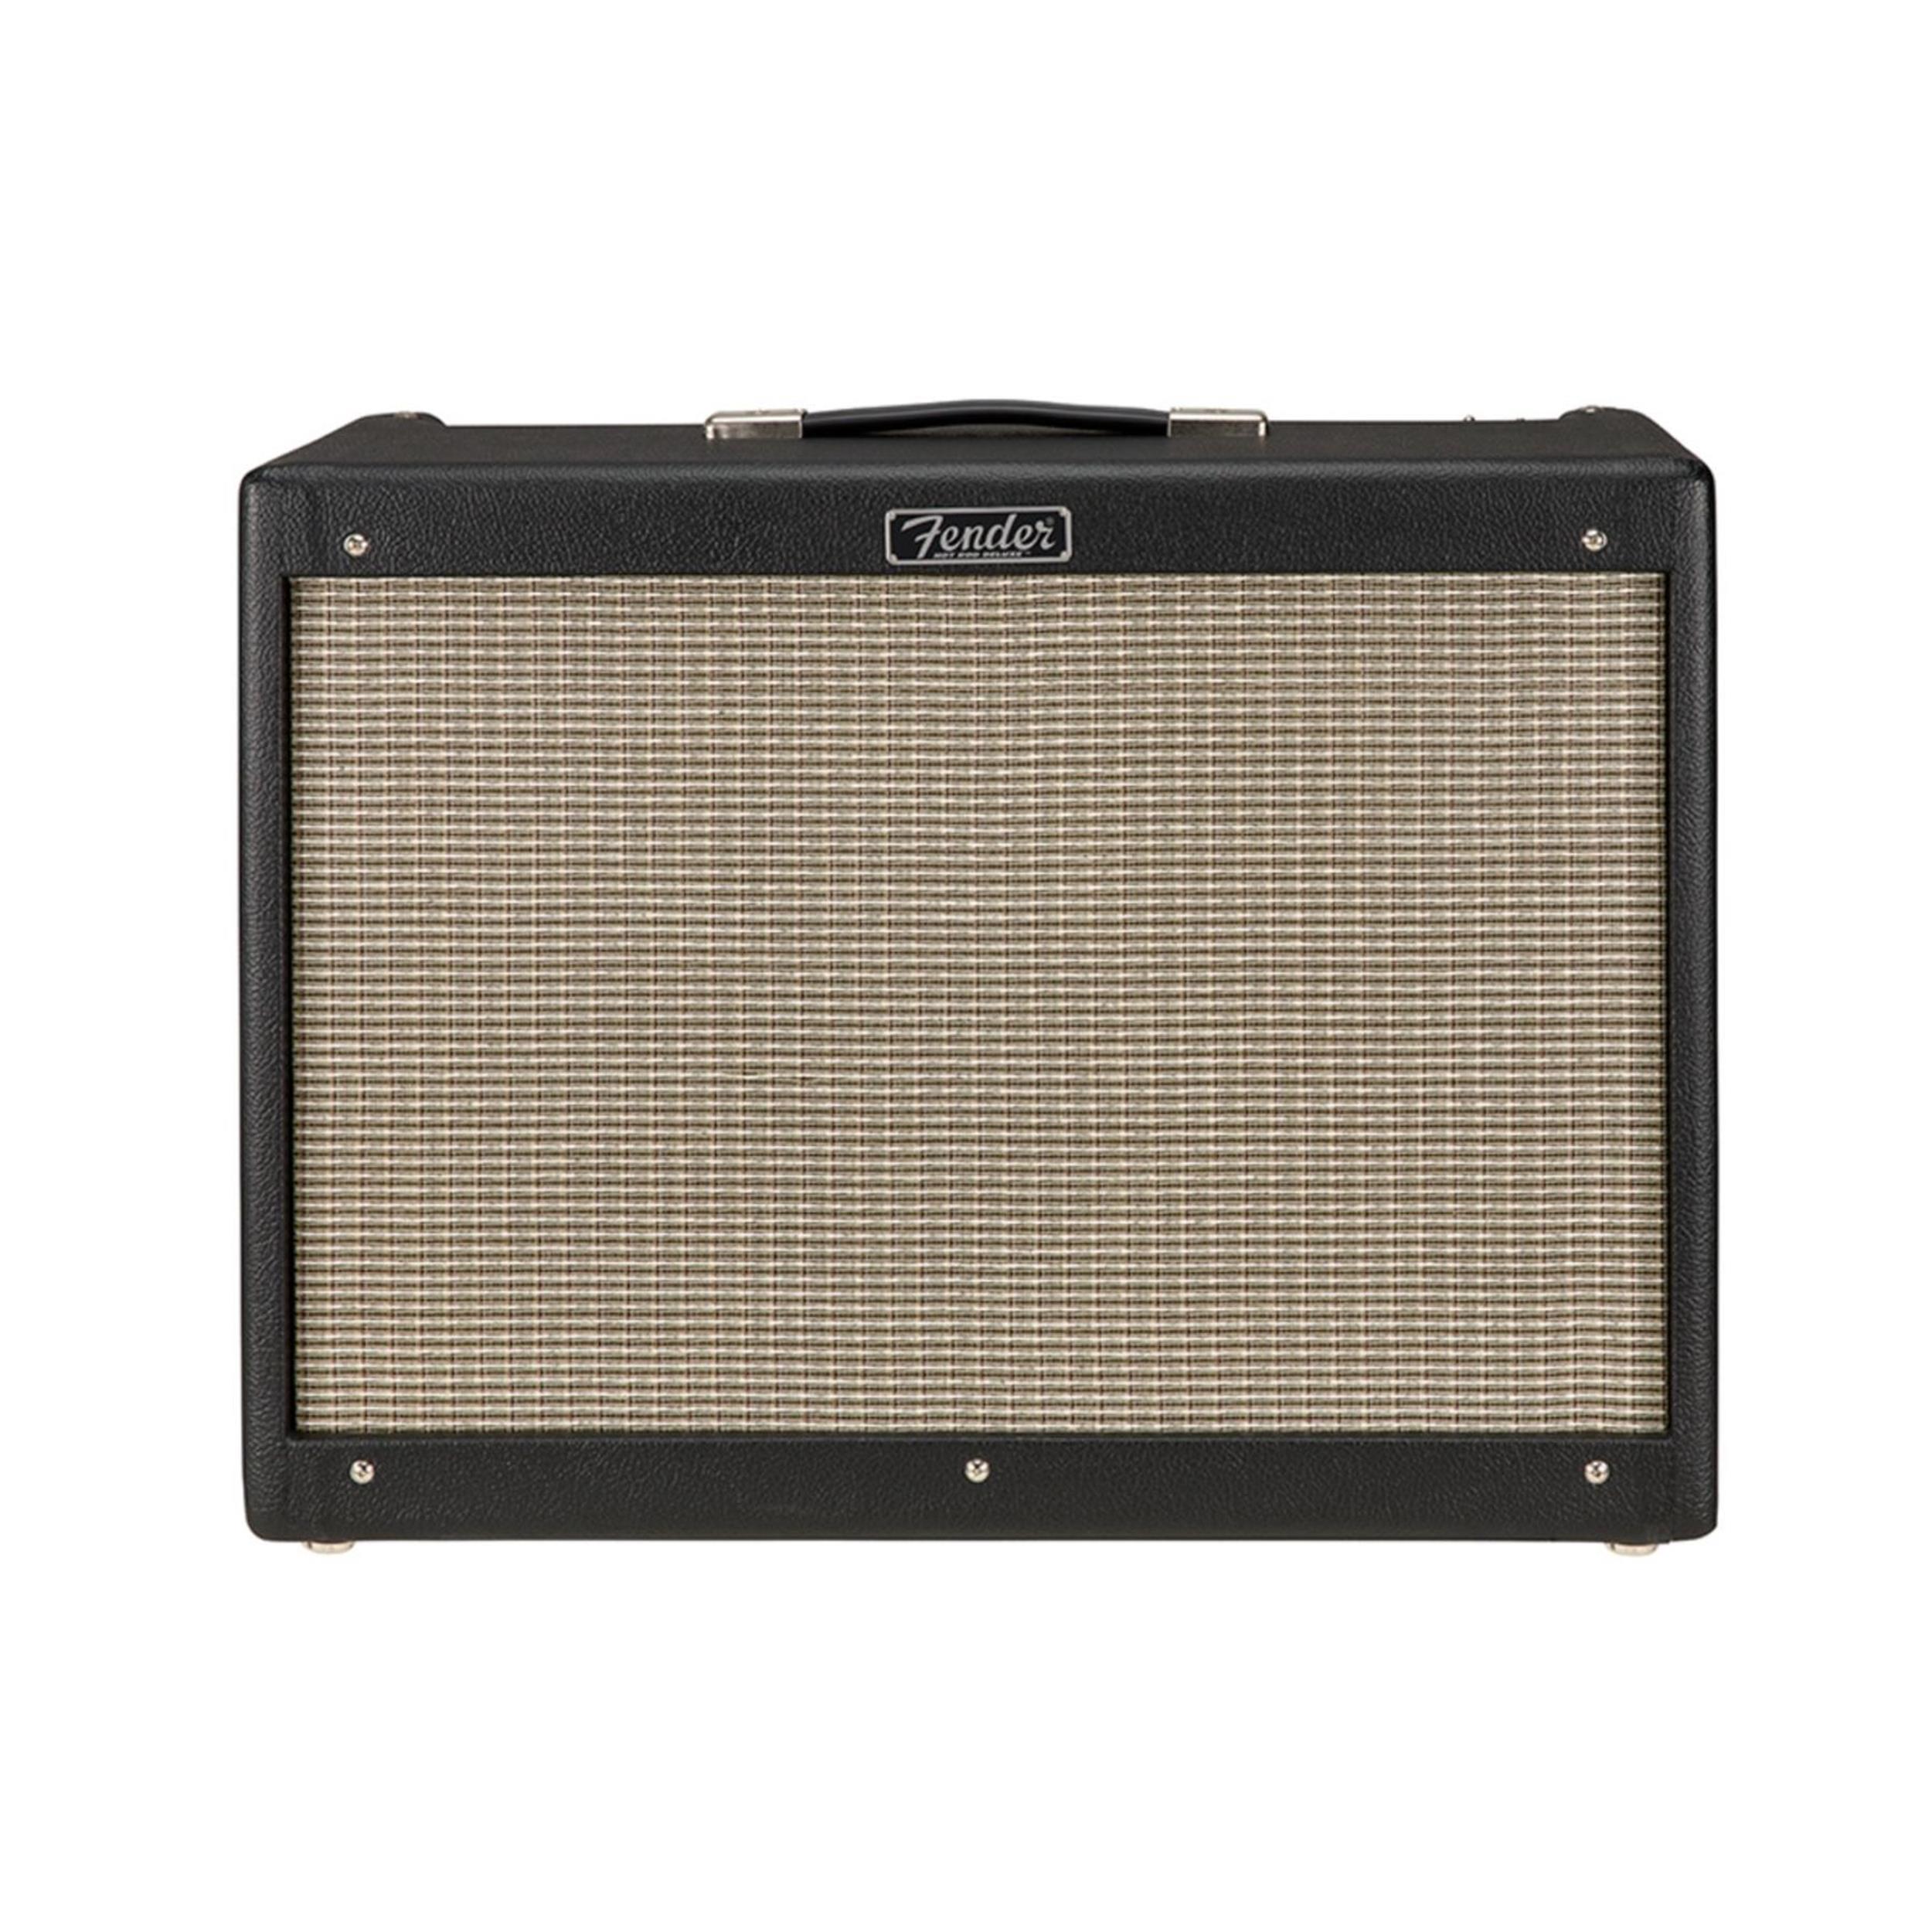 FENDER-Hot-Rod-Deluxe-IV-Black-2231206000-sku-20659